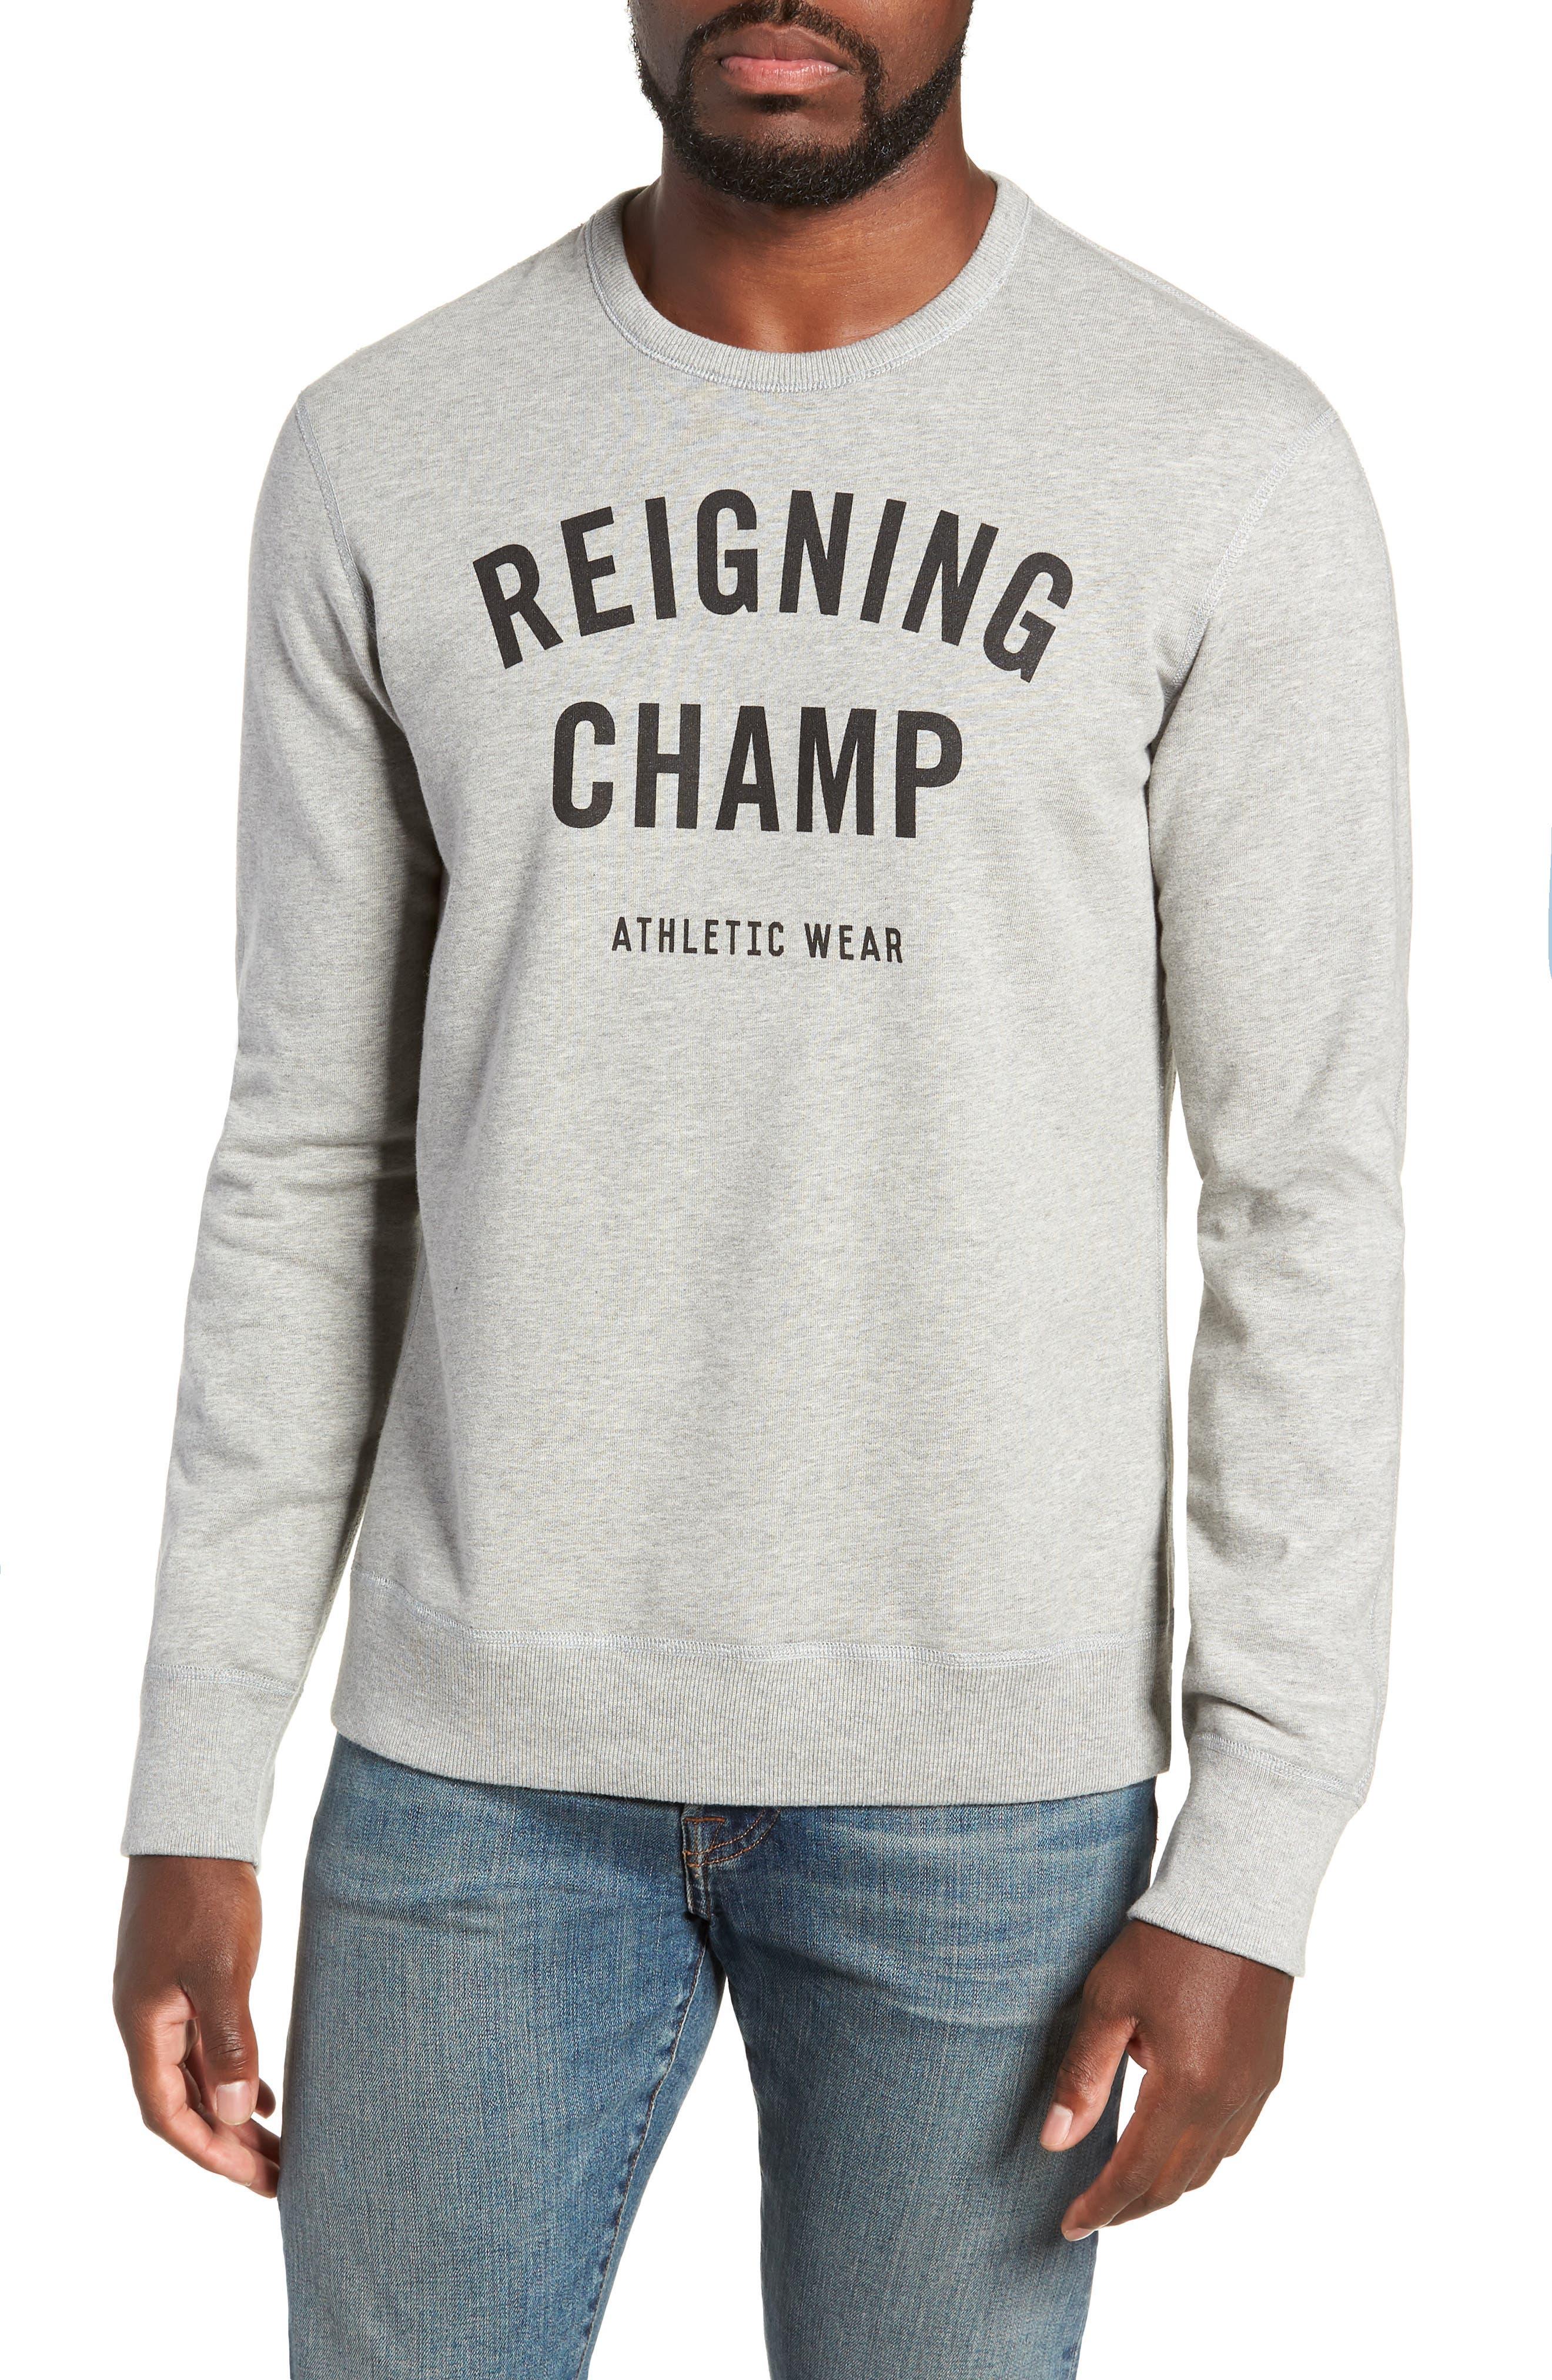 REIGNING CHAMP Gym Logo Sweatshirt, Main, color, HEATHER GREY/ BLACK